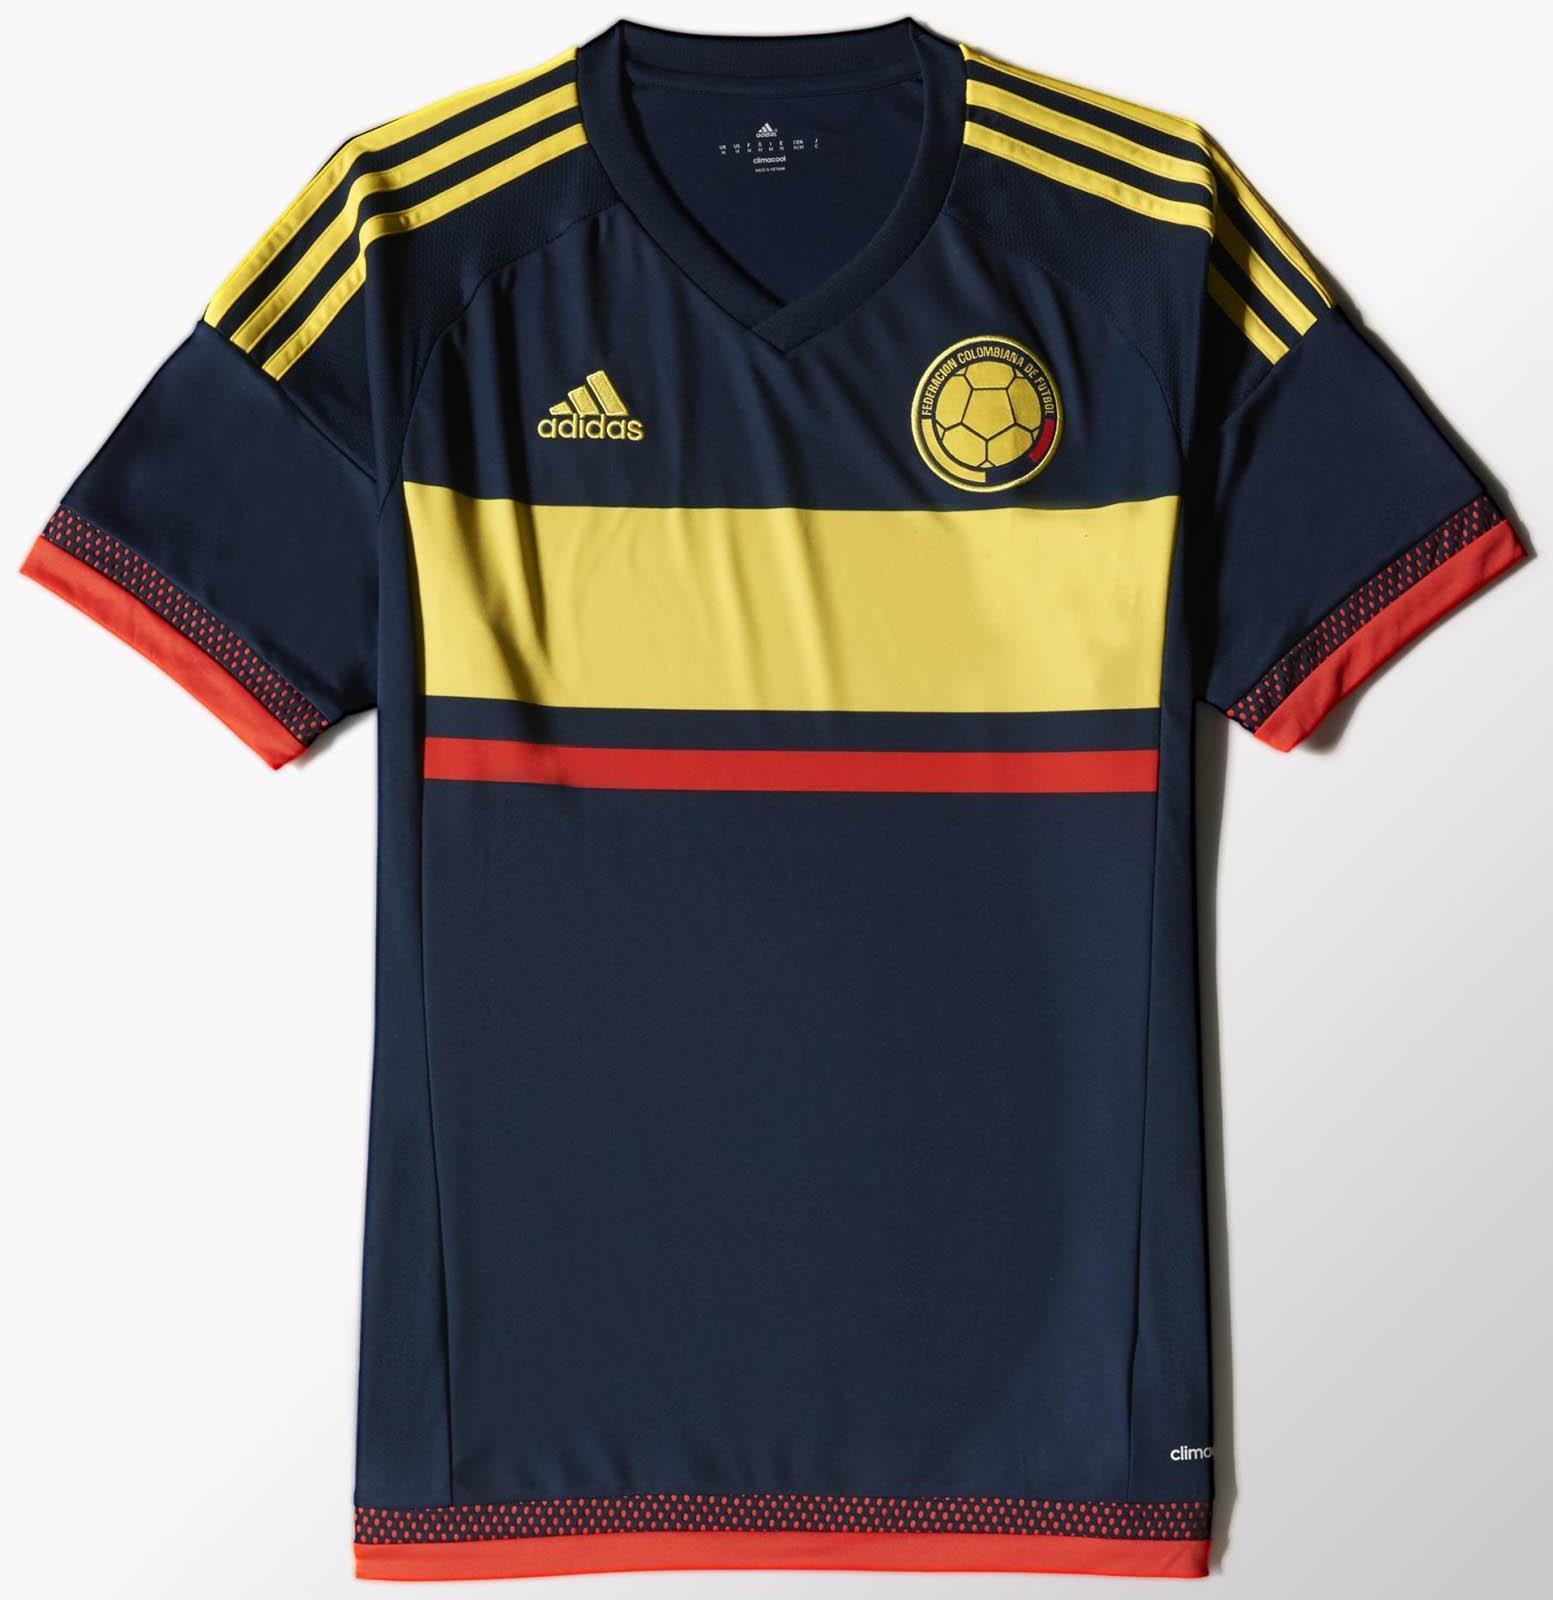 Camiseta Adidas Seleccion Colombia 2015 Adidas Colombia 2015 Away